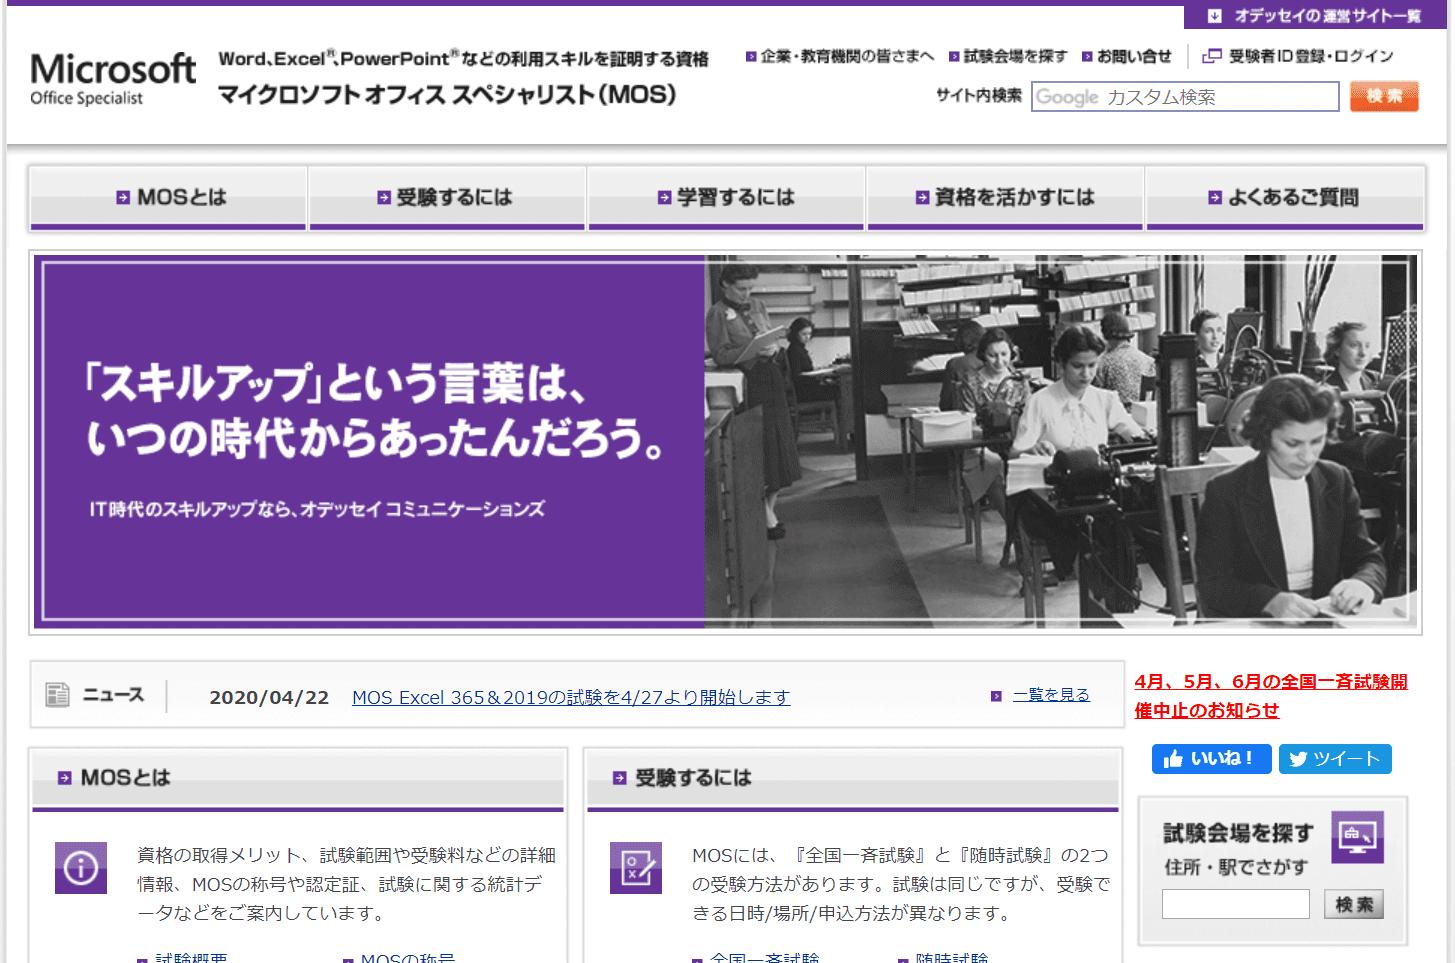 MOS(マイクロソフト オフィス スペシャリスト)